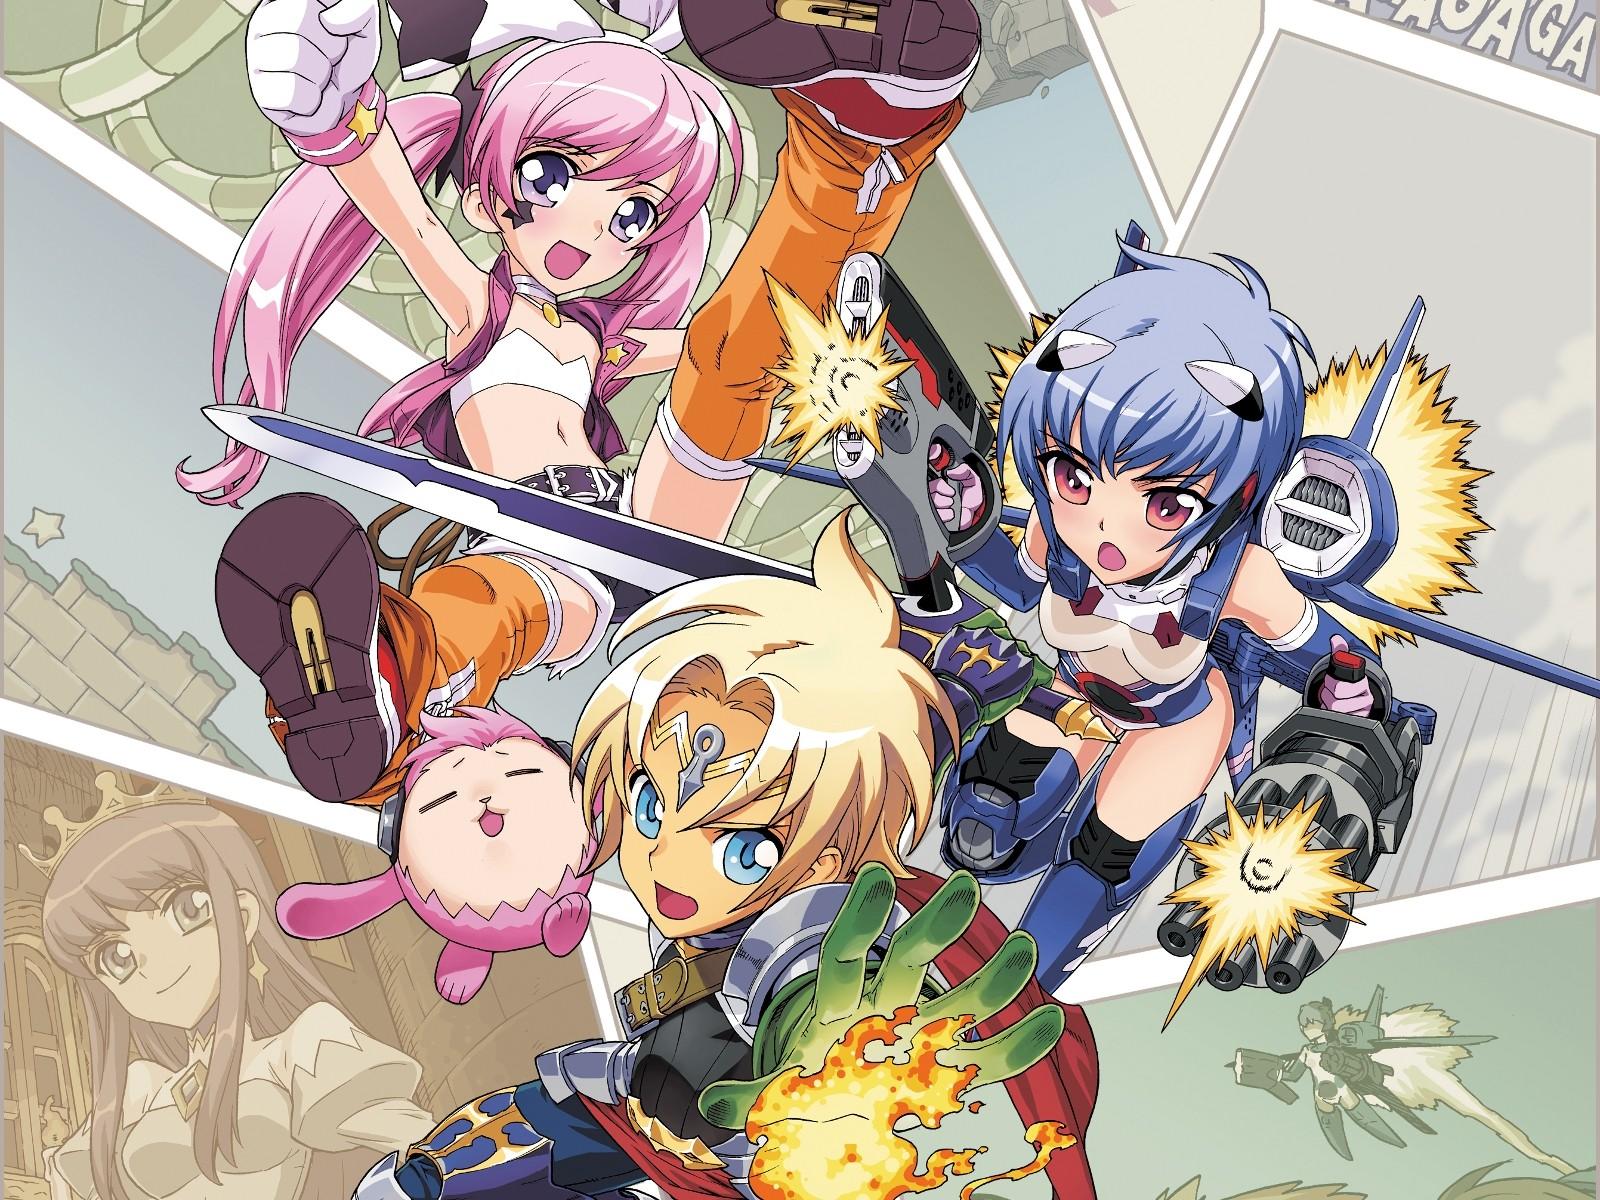 Illustration Anime Anime Girls Anime Boys Cartoon Rpg Comics Rpg Maker Mangaka Comic Book